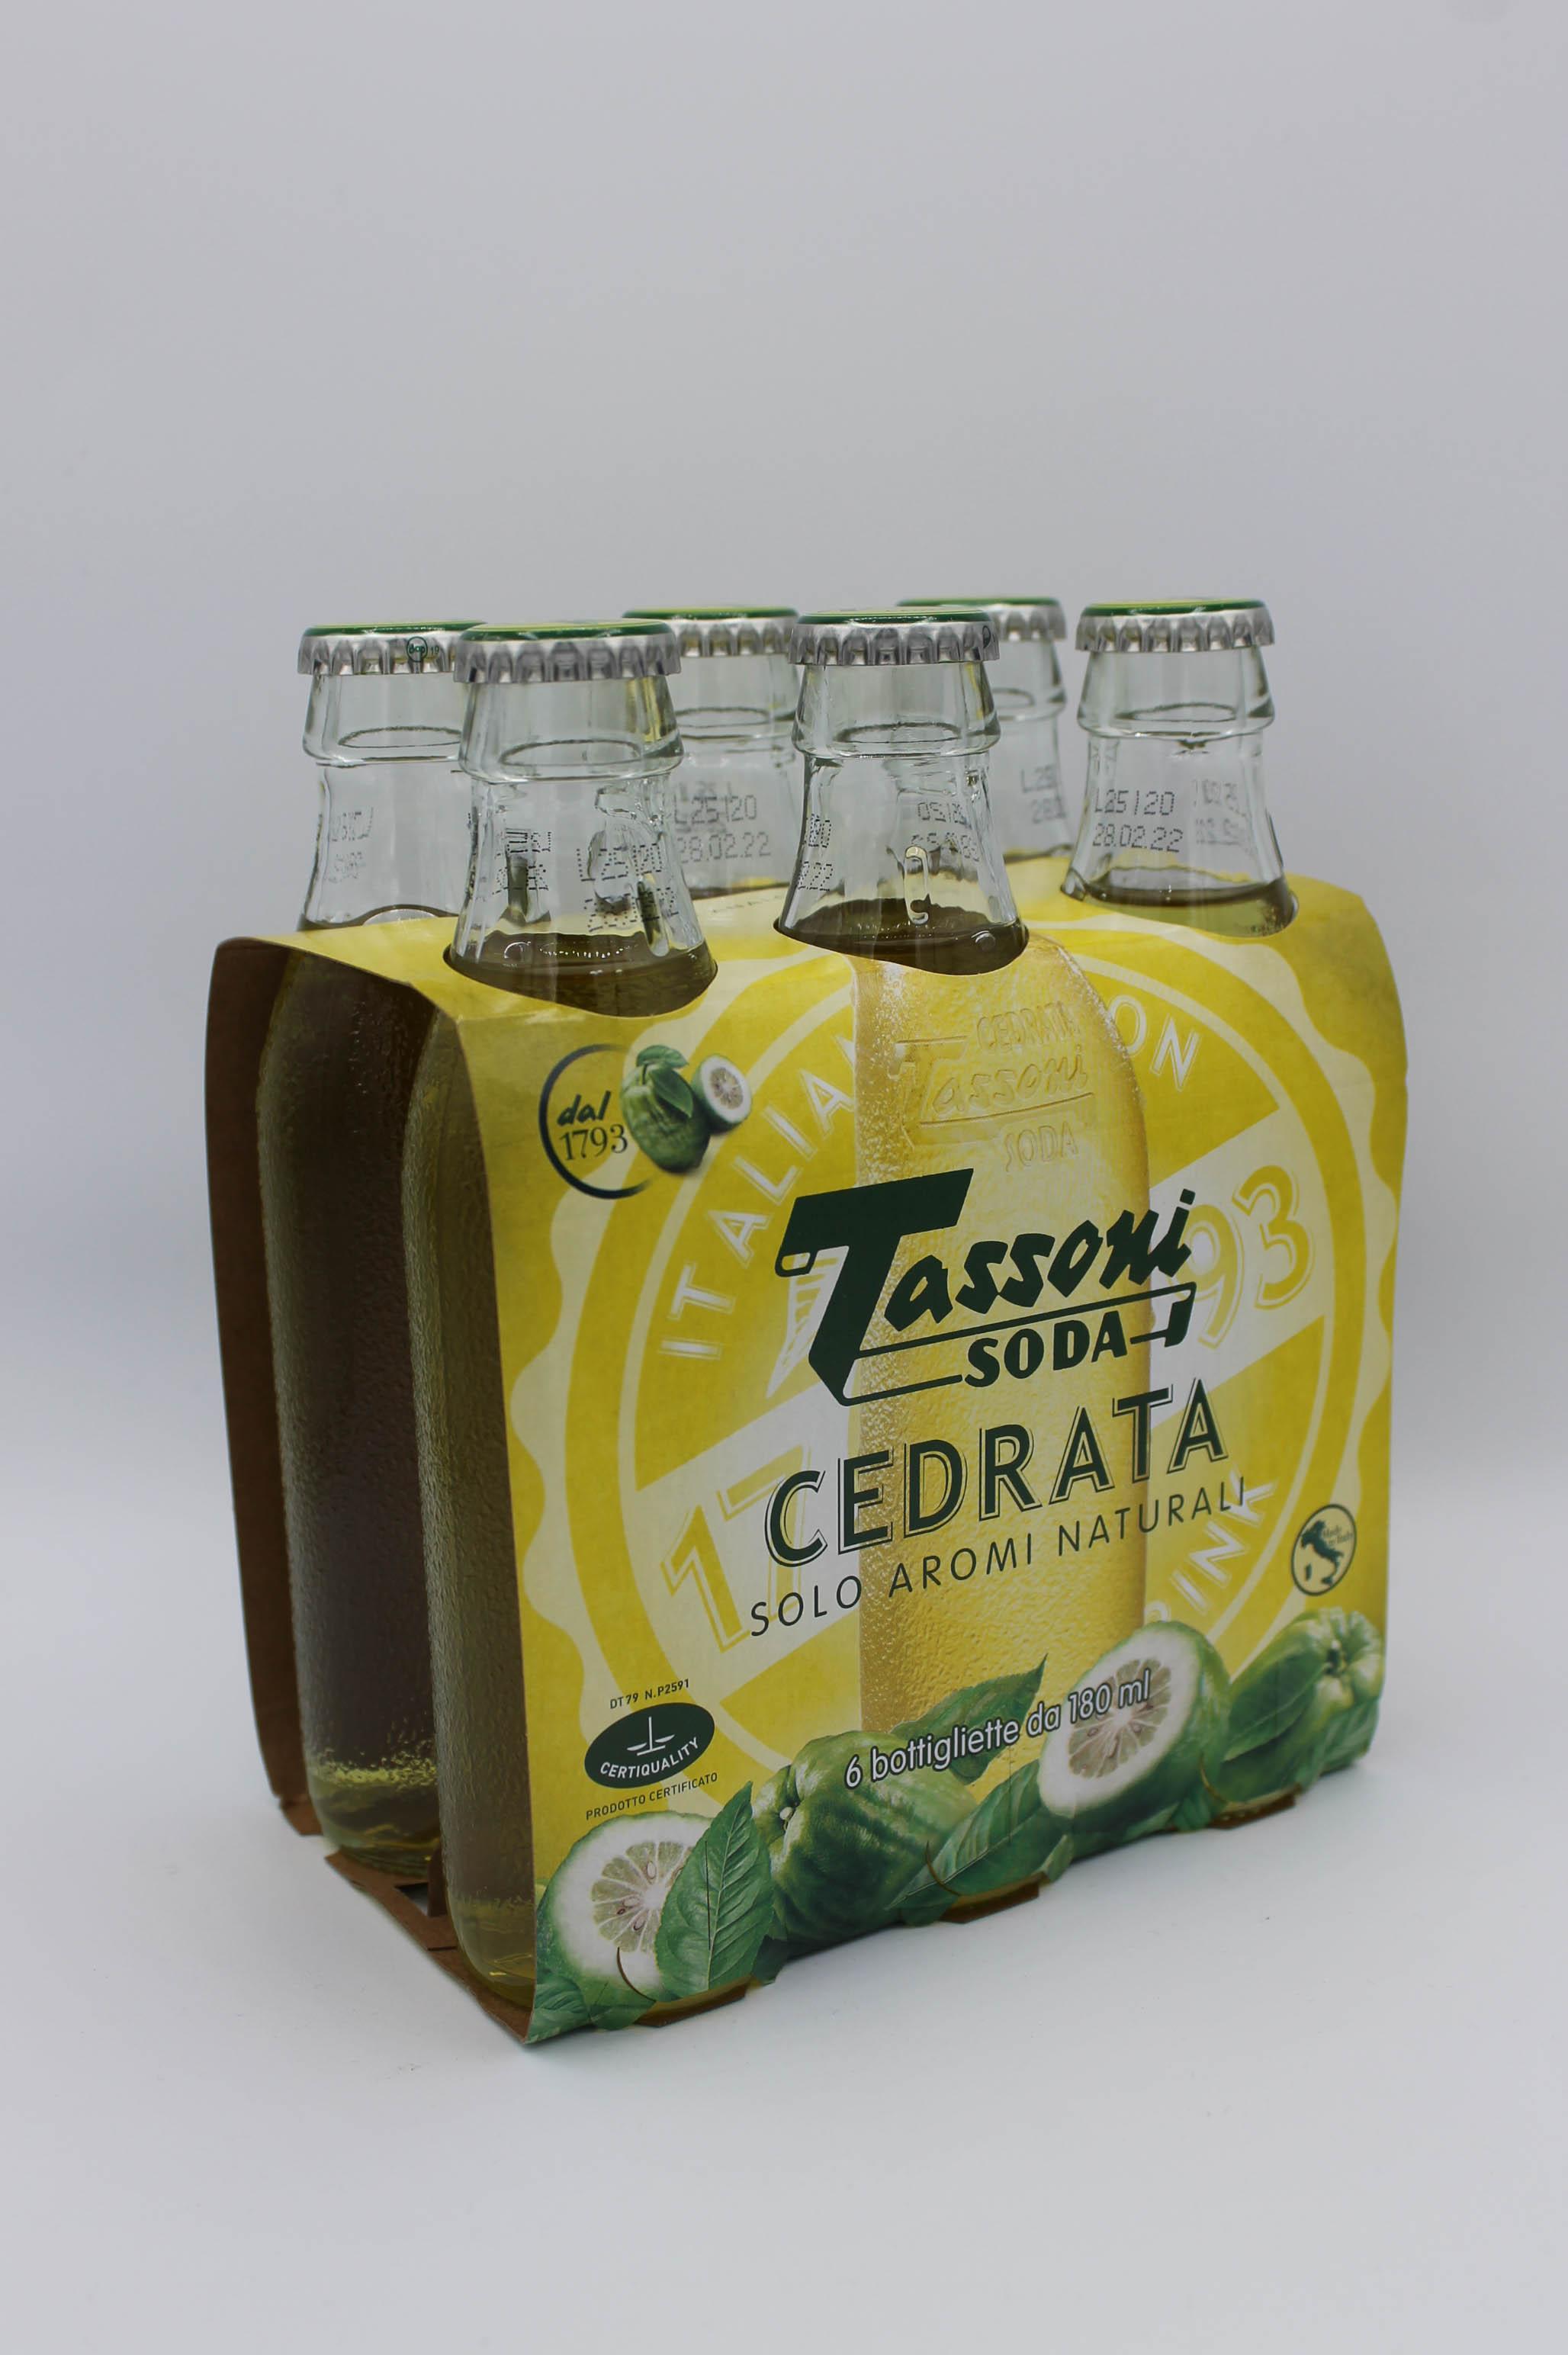 Tassoni cedrata 6x180ml.